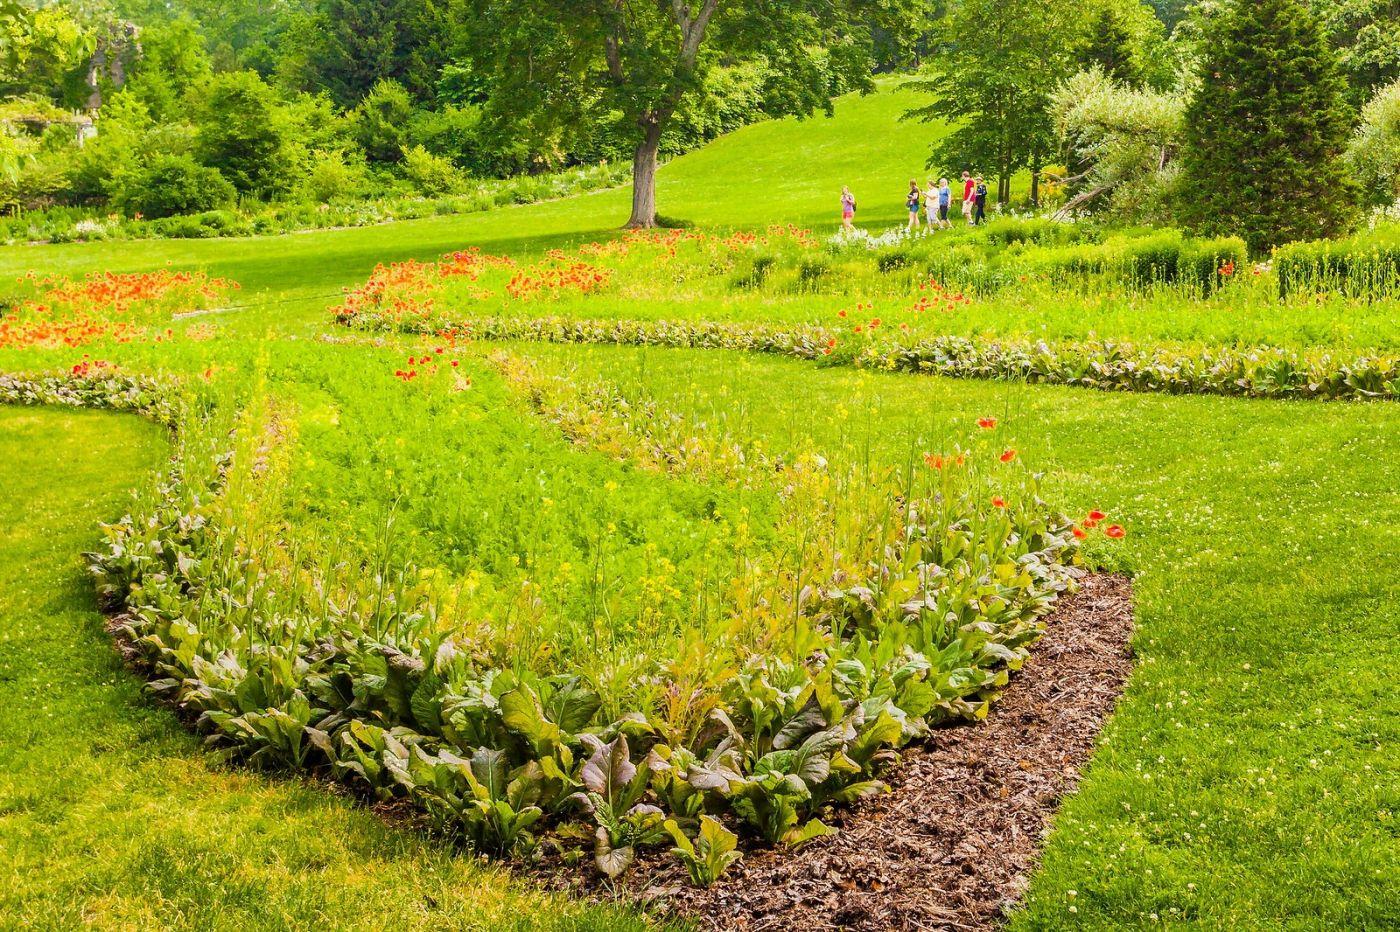 Chanticleer花园,融入自然_图1-8